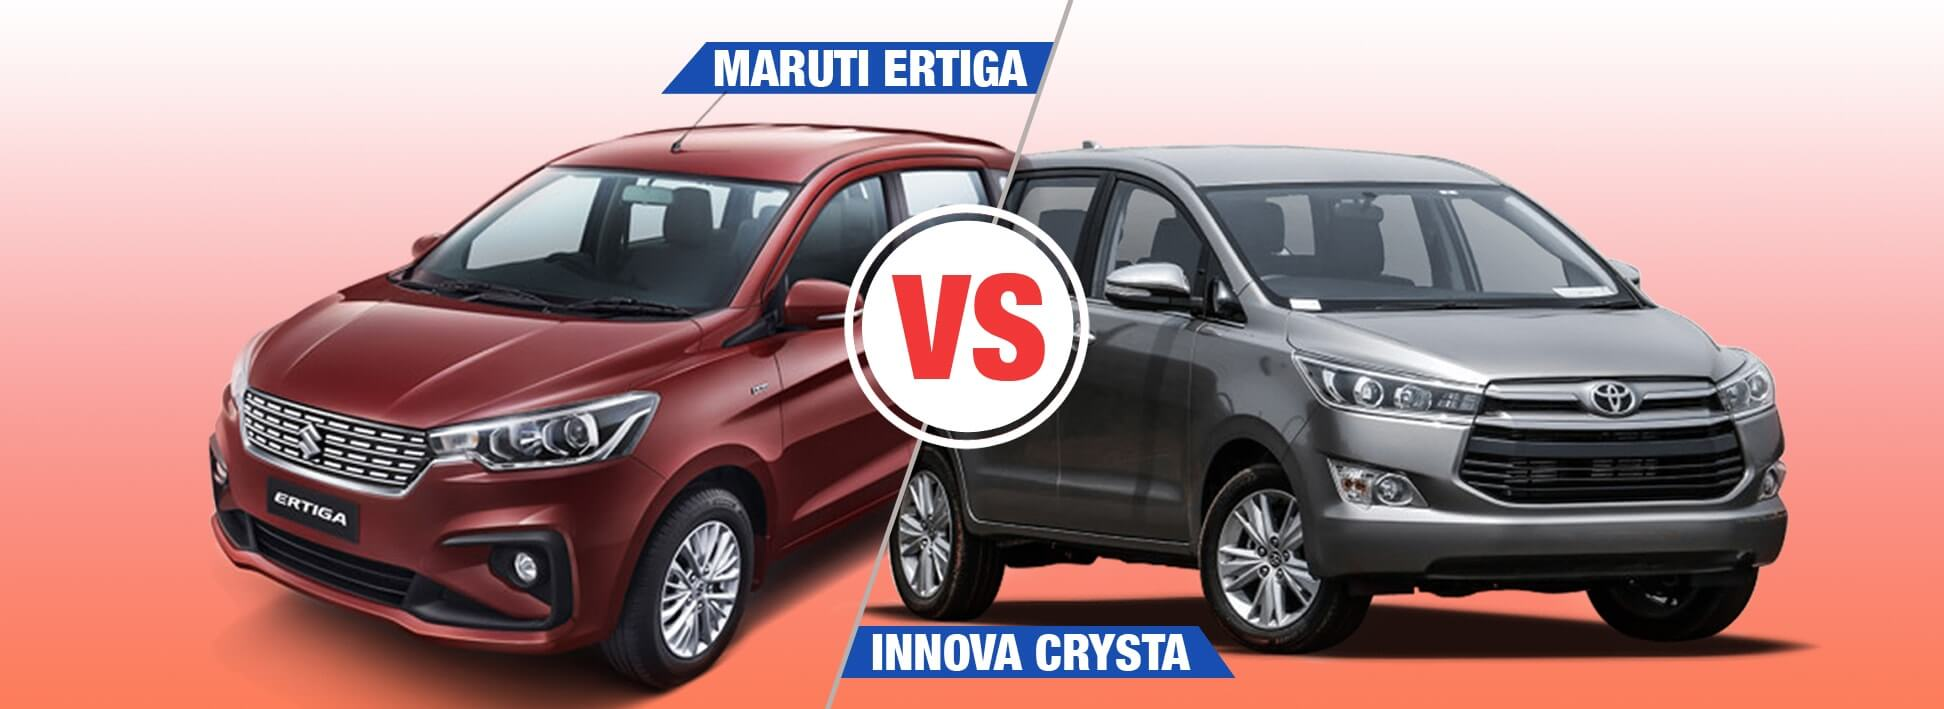 Maruti Suzuki Ertiga 2018 Vs Toyota Innova Crysta Comparison - Interior, Exterior, Specification, Price